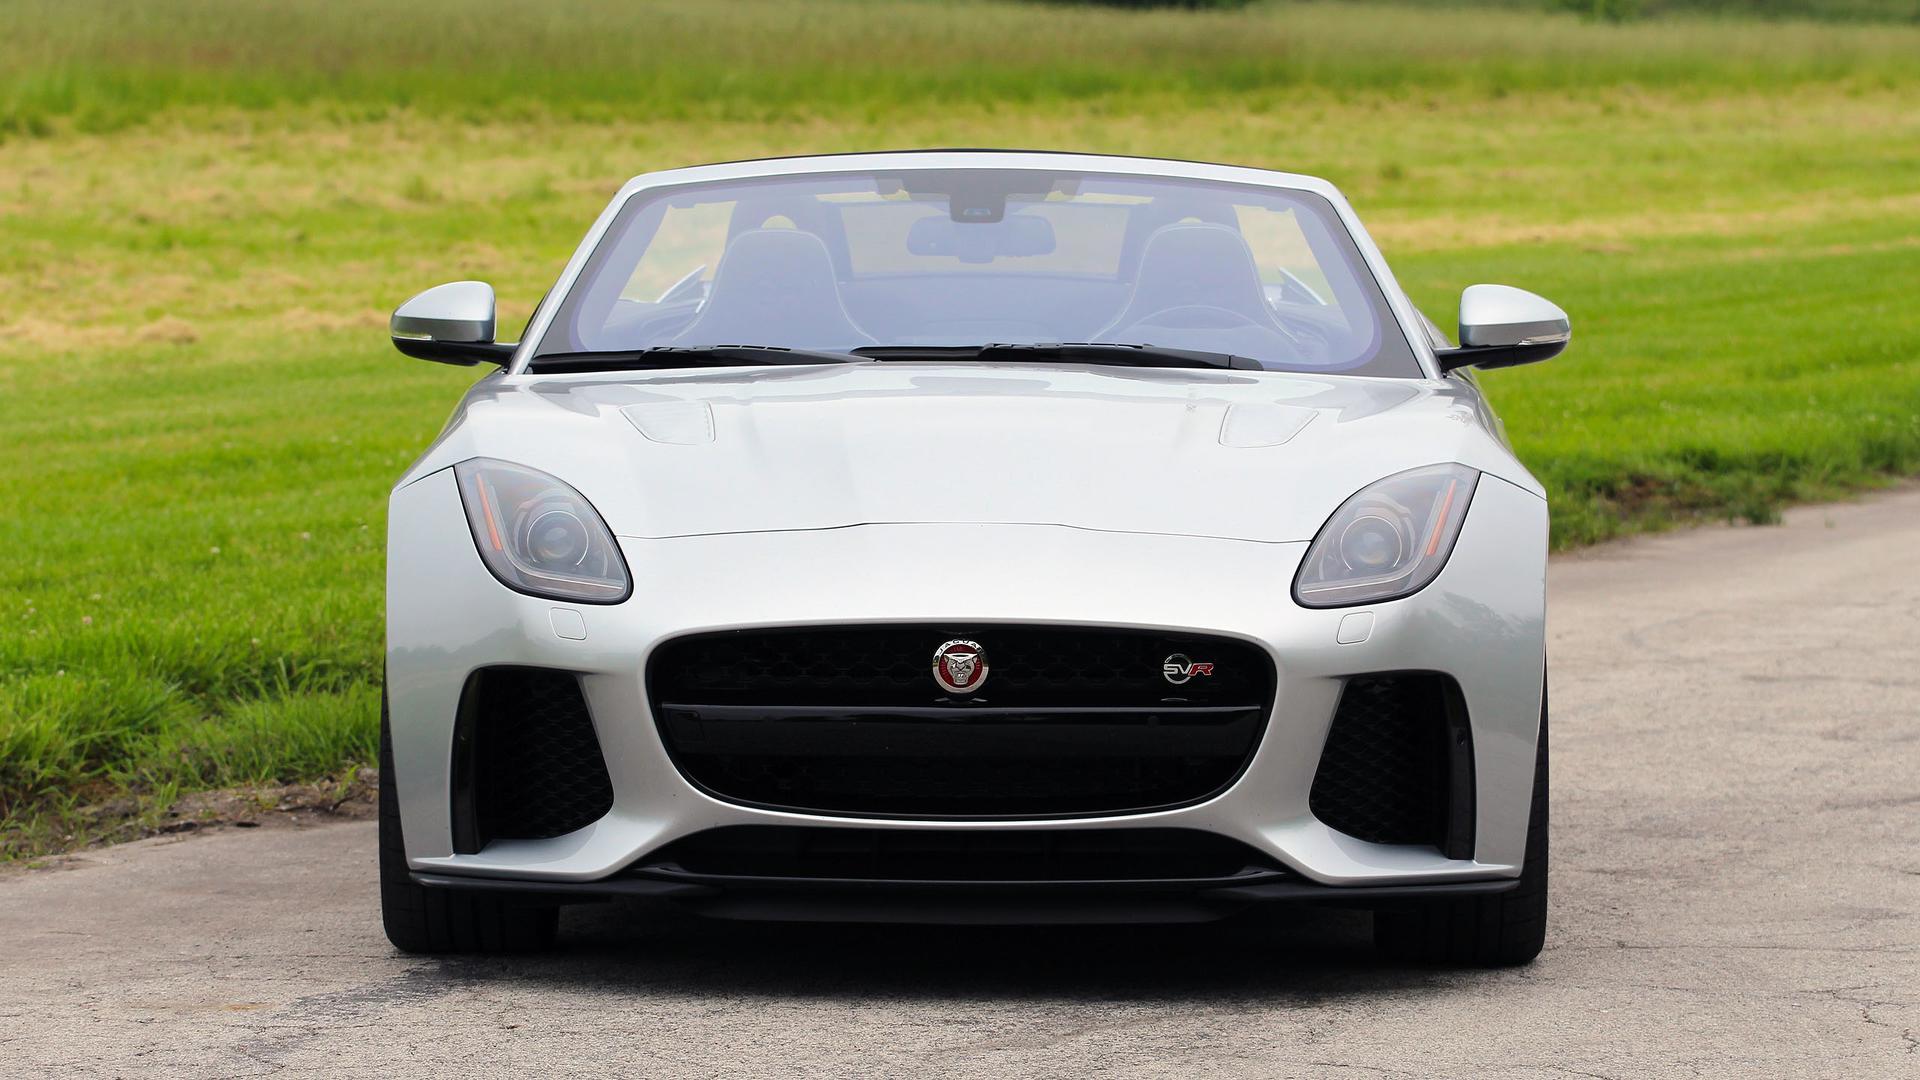 the jaguar wiki flickr car convertible spy file